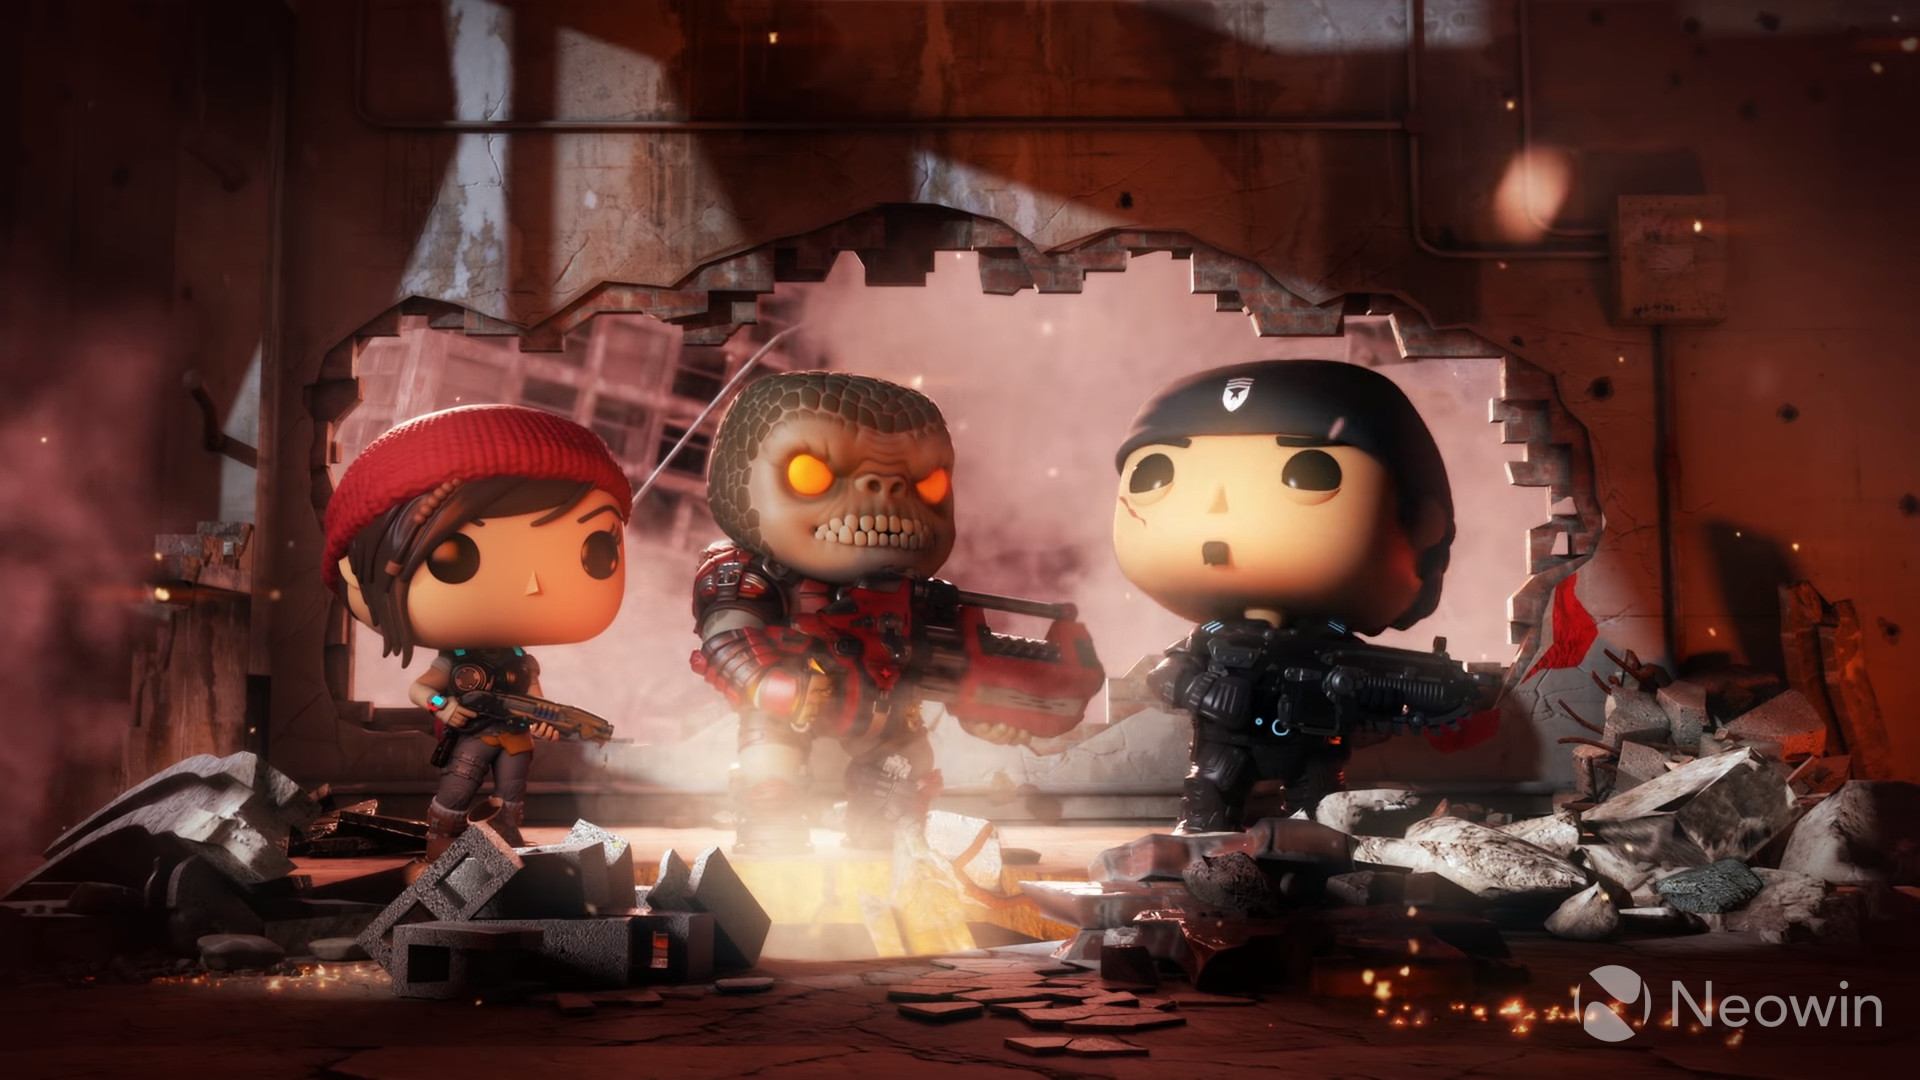 New Gears Of War Funko Pop Figures Will Be Hitting Store Shelves